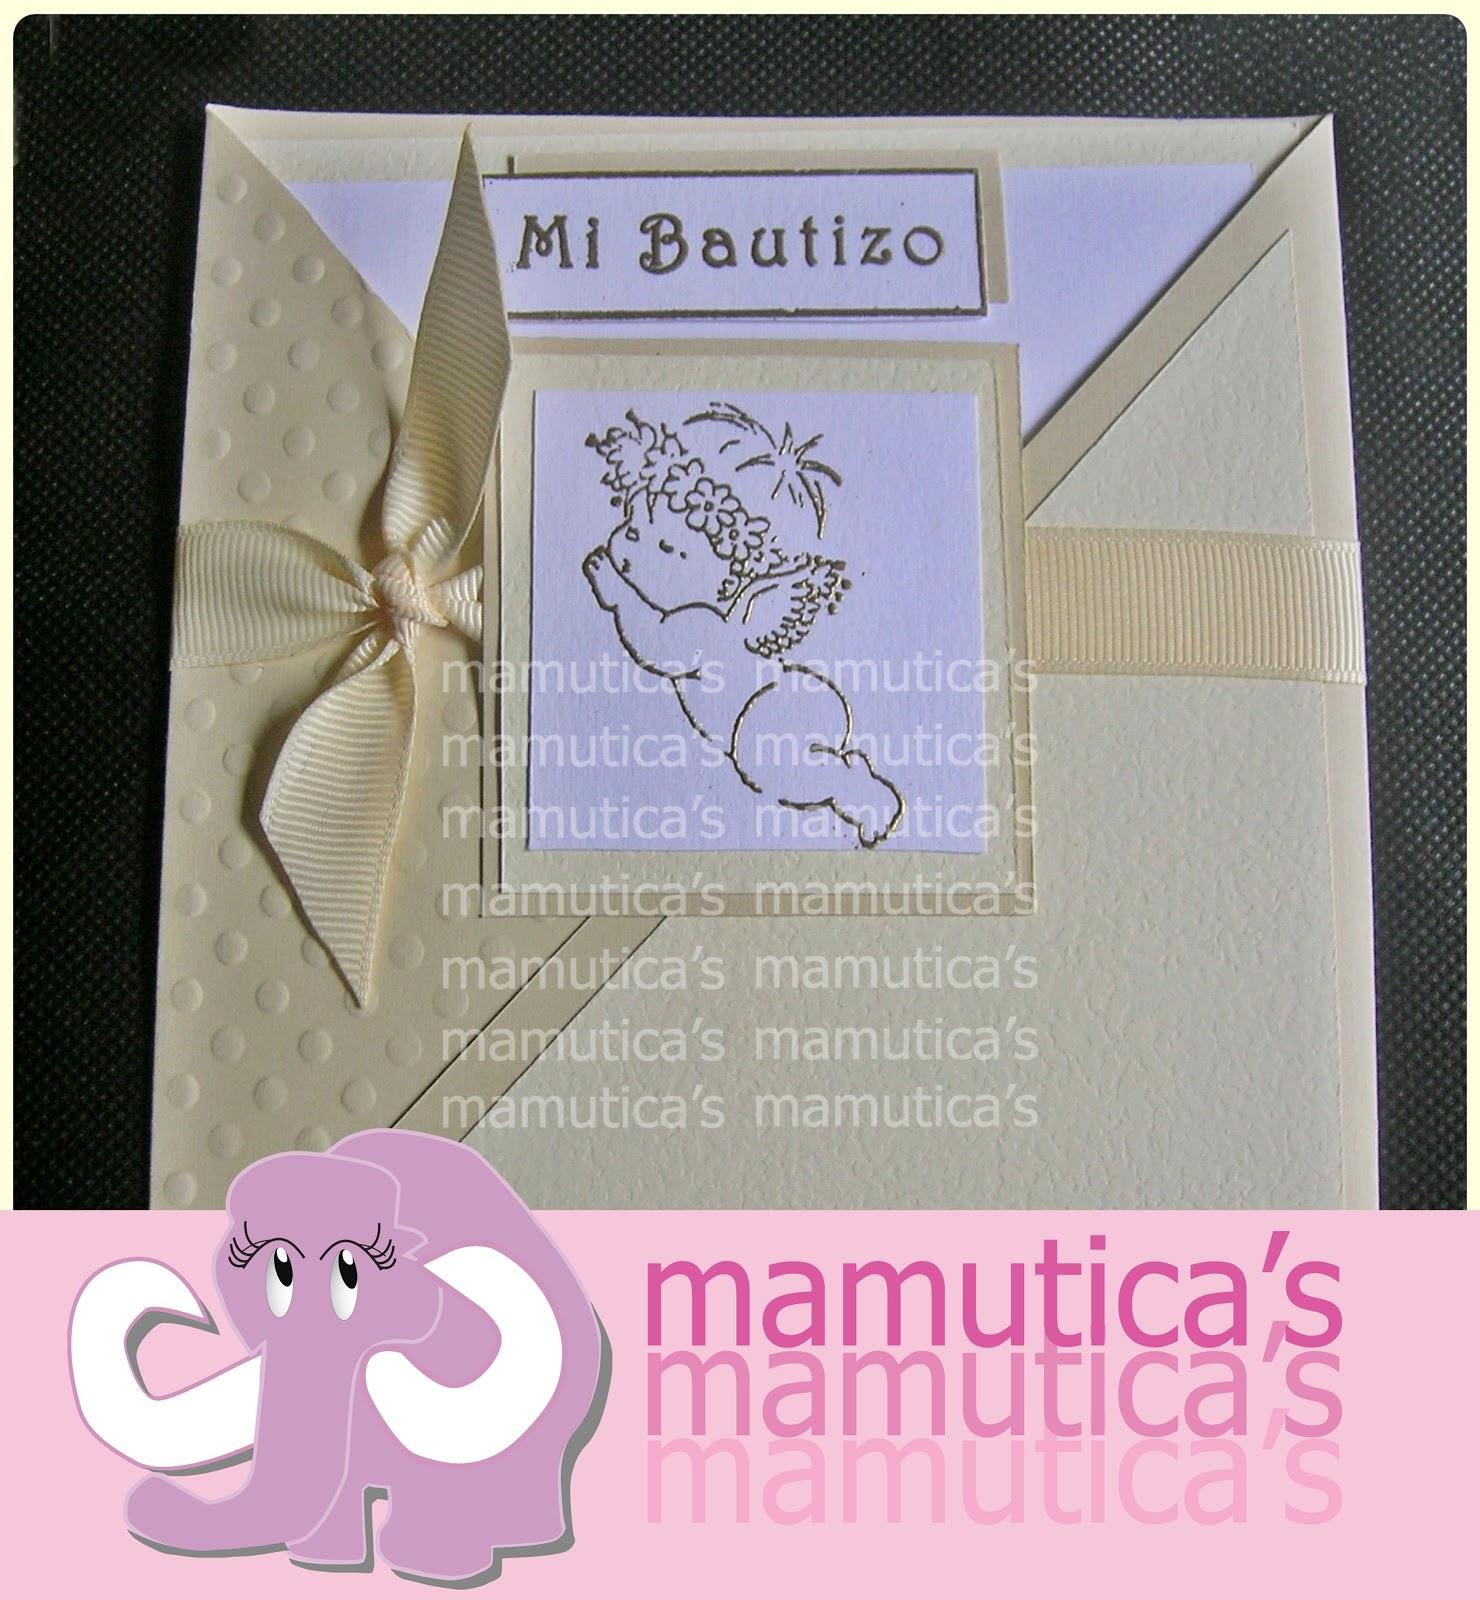 http://3.bp.blogspot.com/-z-byHFBeq9I/UK_abH6KMsI/AAAAAAAAC_Q/cWG_MpyMRiM/s1600/la+tarjeta.jpg